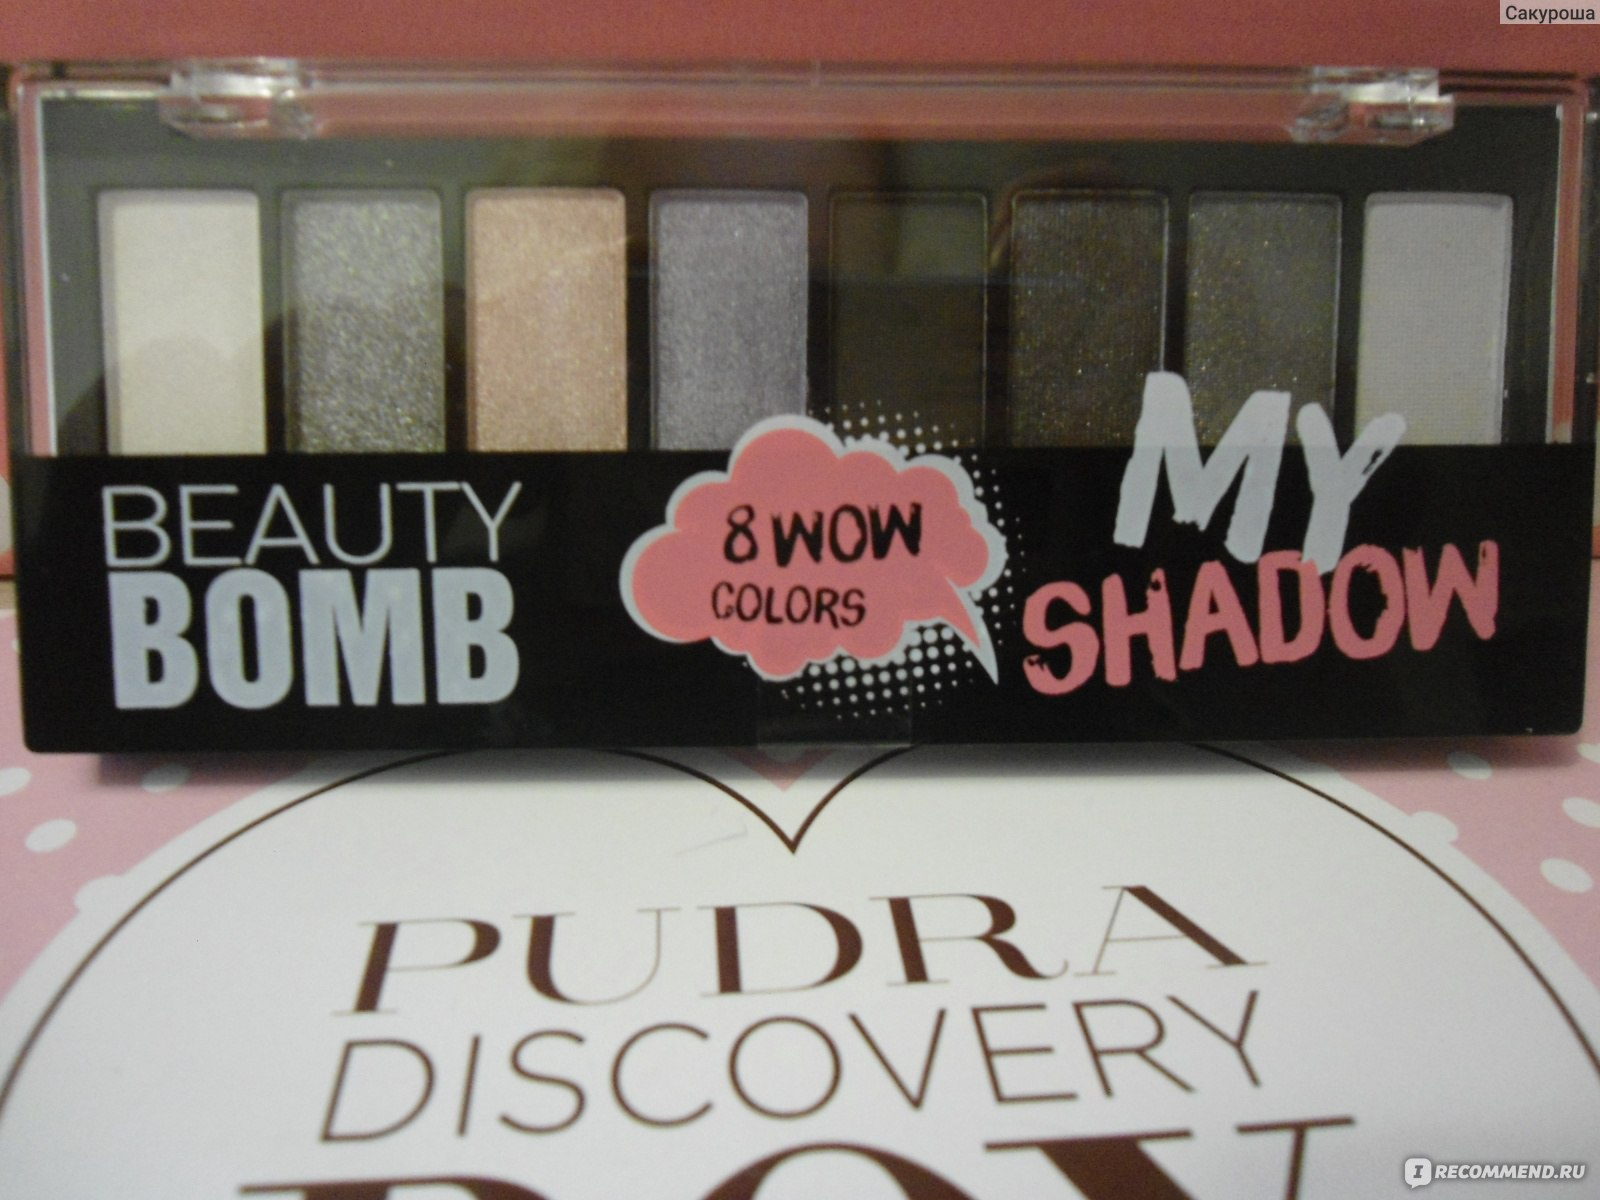 Интернет-магазин косметики и парфюмерии PUDRA (pudra.ru) - «Pudra ... ba5321671bc